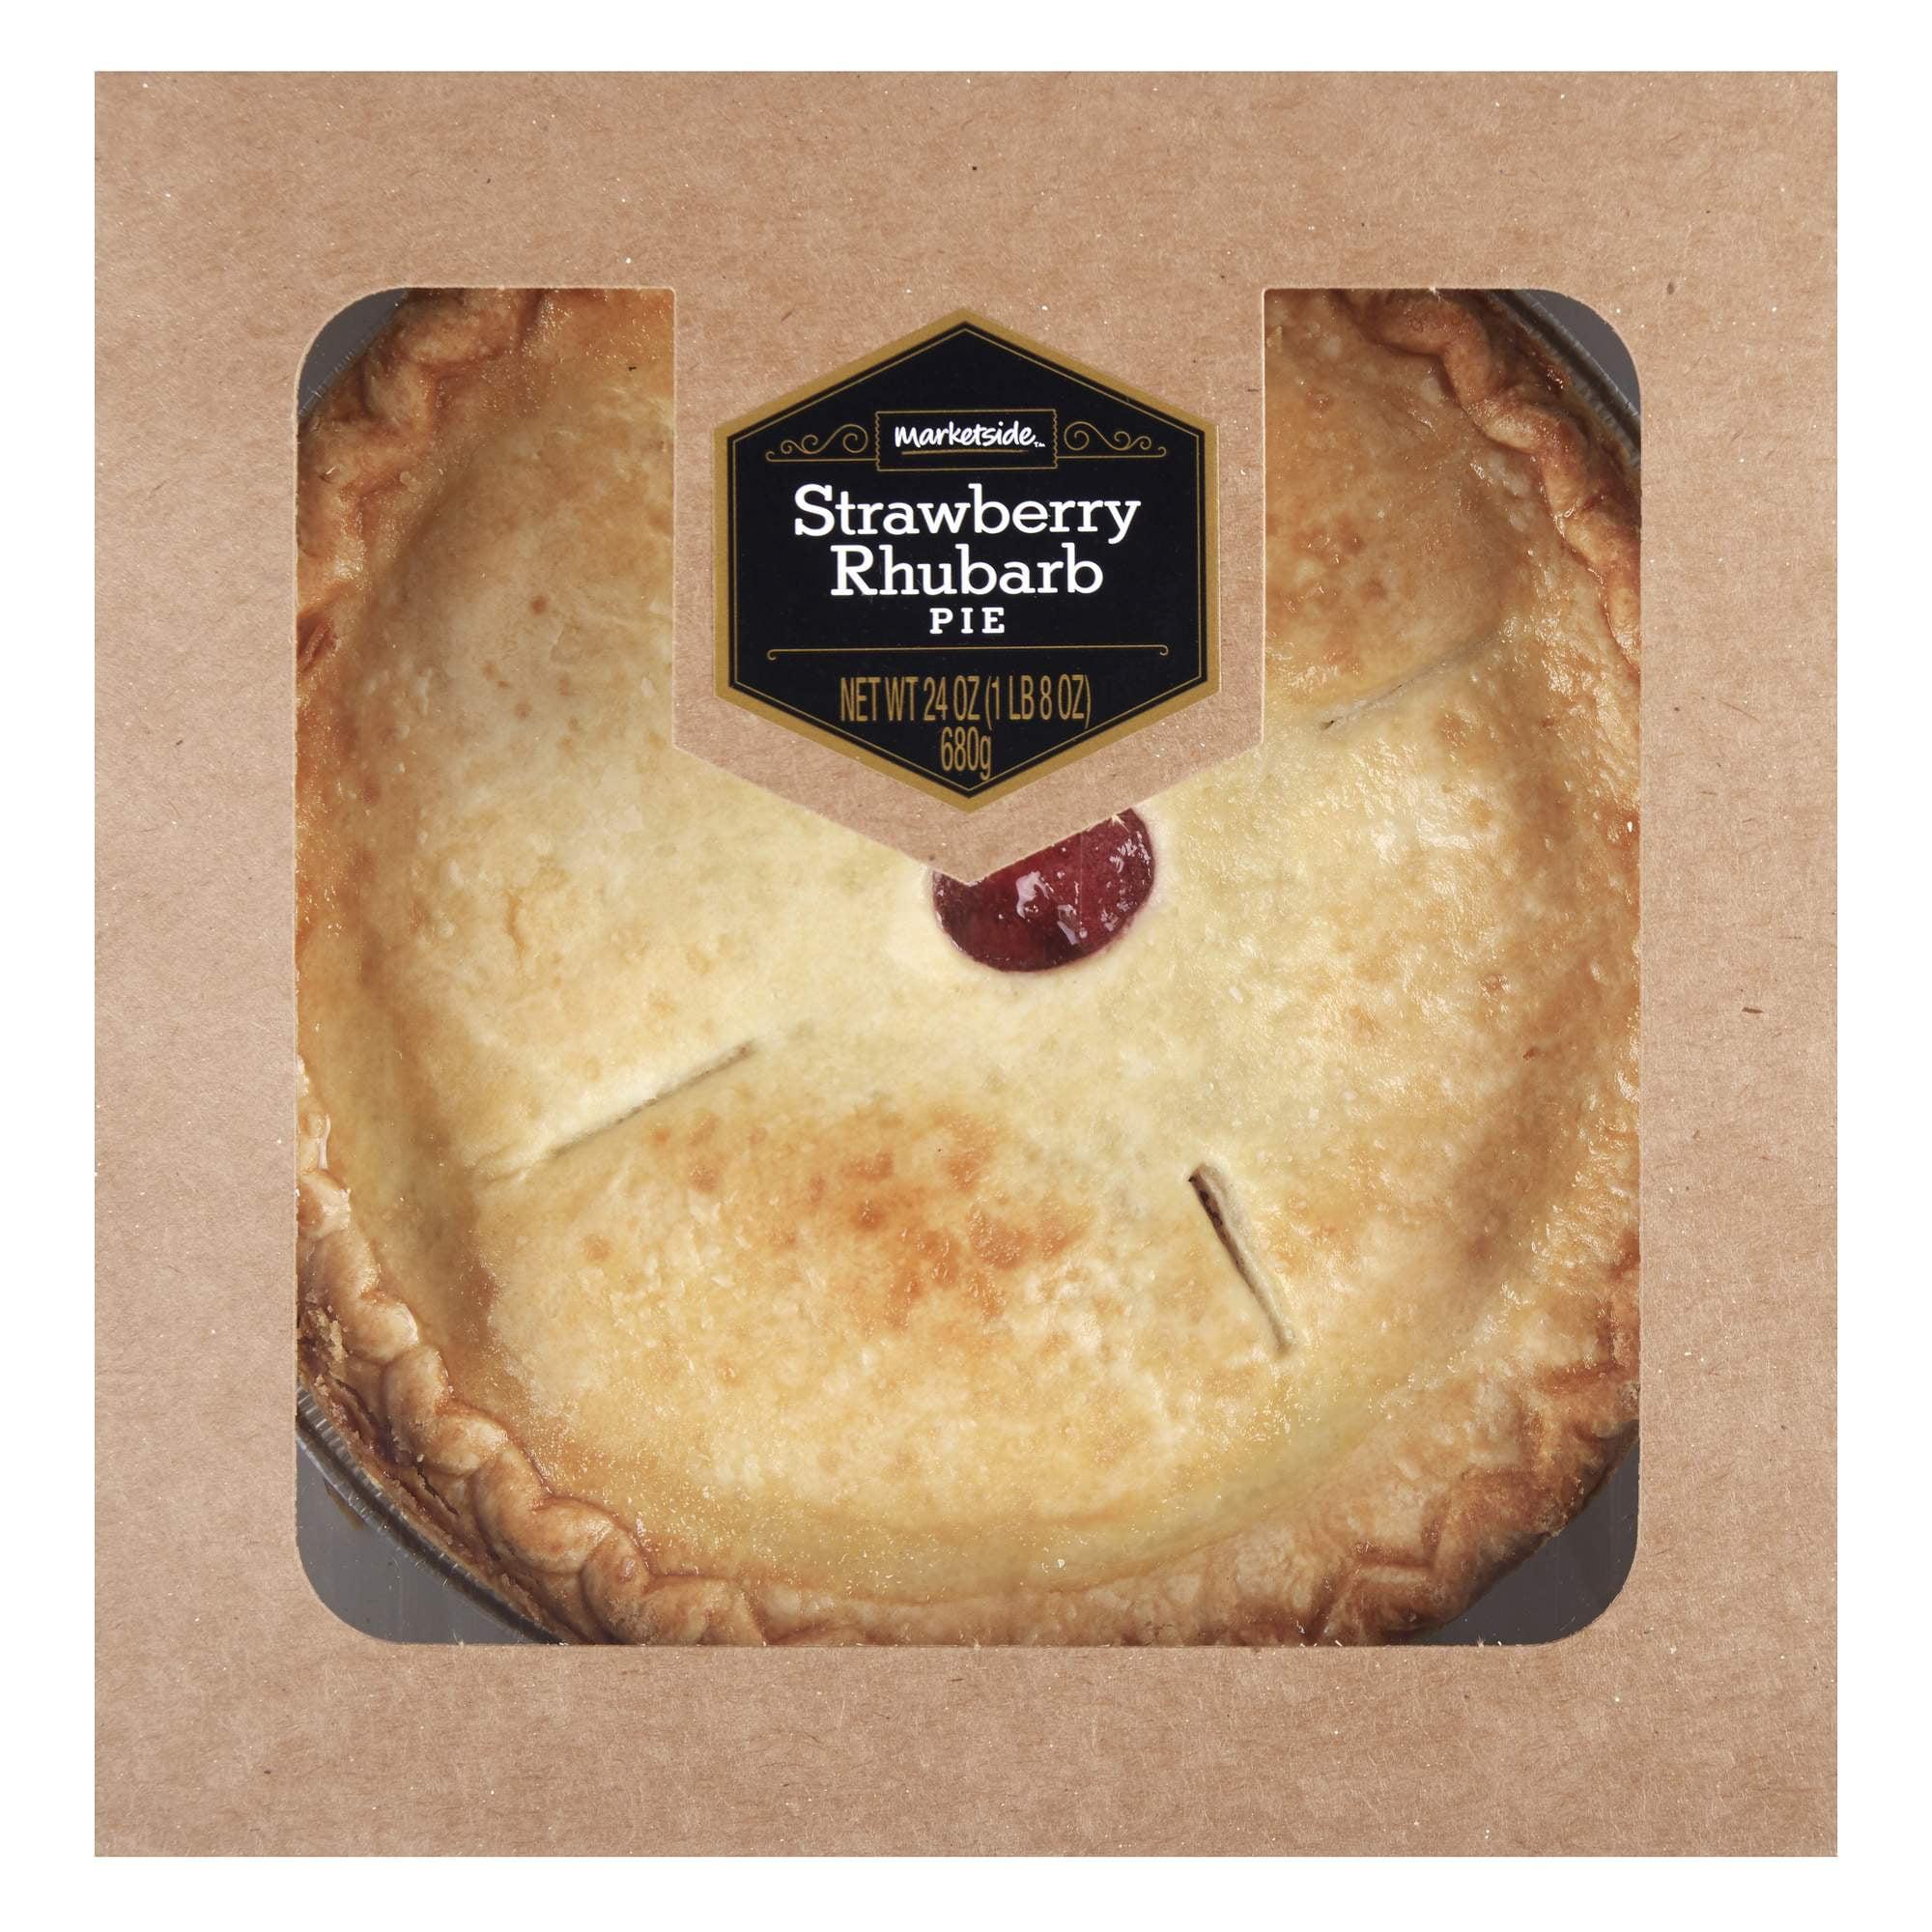 Marketside Strawberry Rhubarb Pie, 24 oz